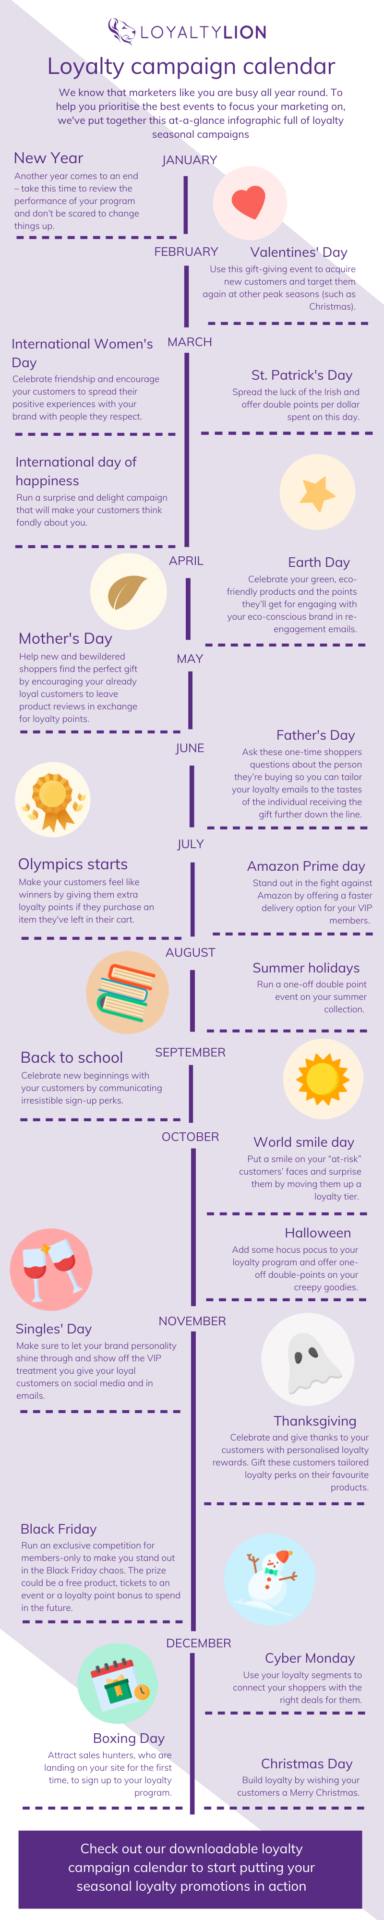 Infographic 2020 Marketing Calendar